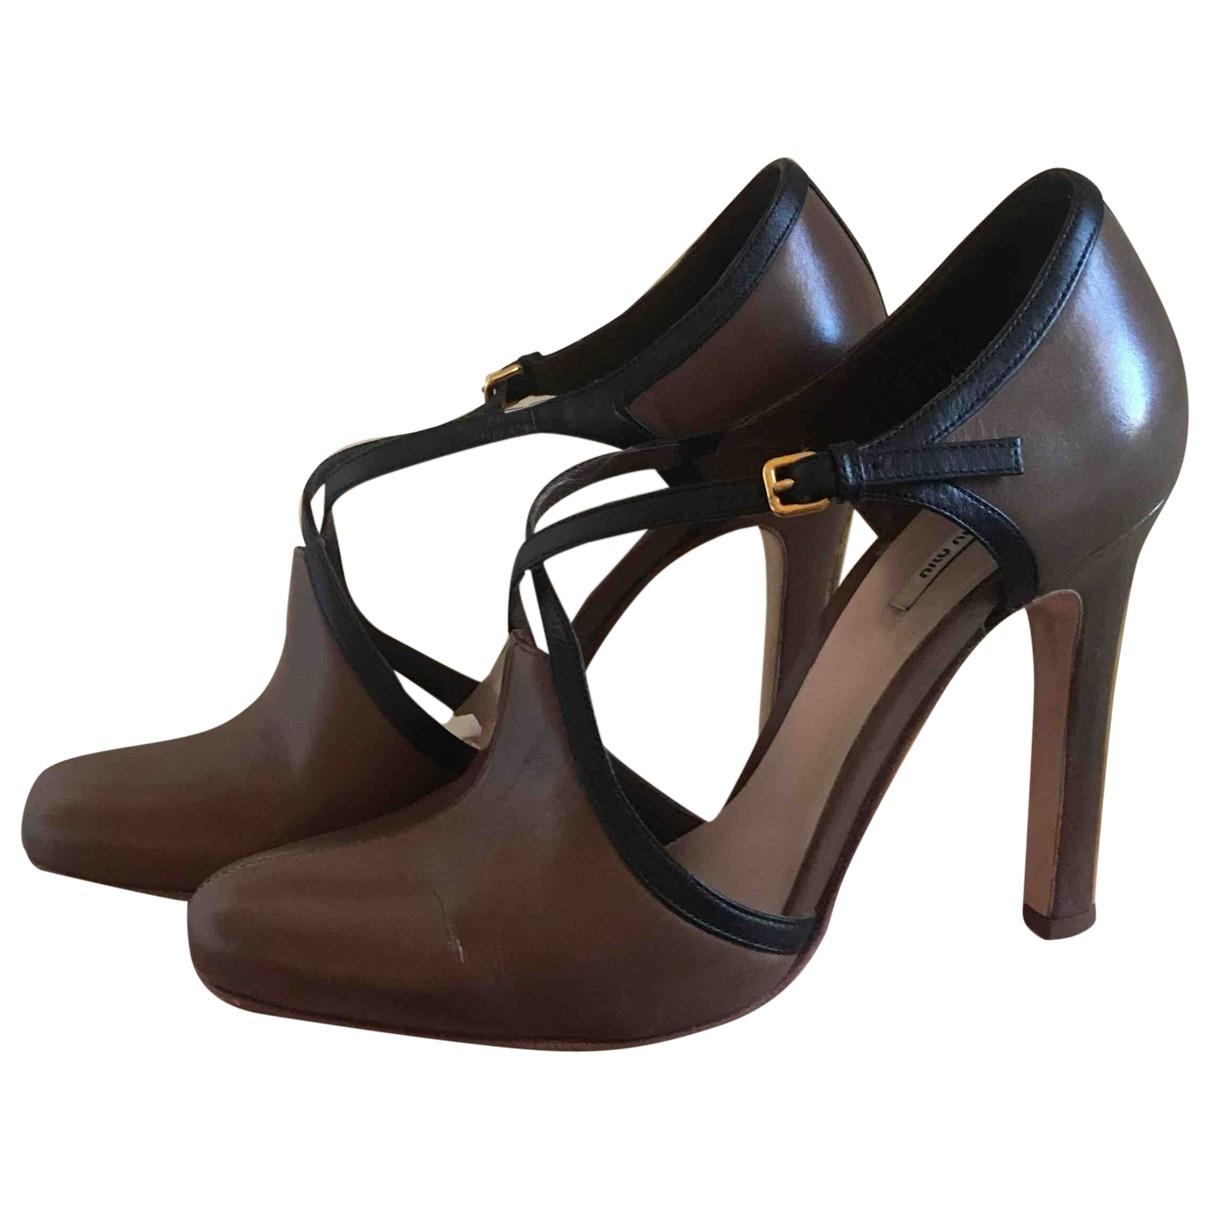 Miu Miu \N Brown Leather Heels for Women 37.5 EU